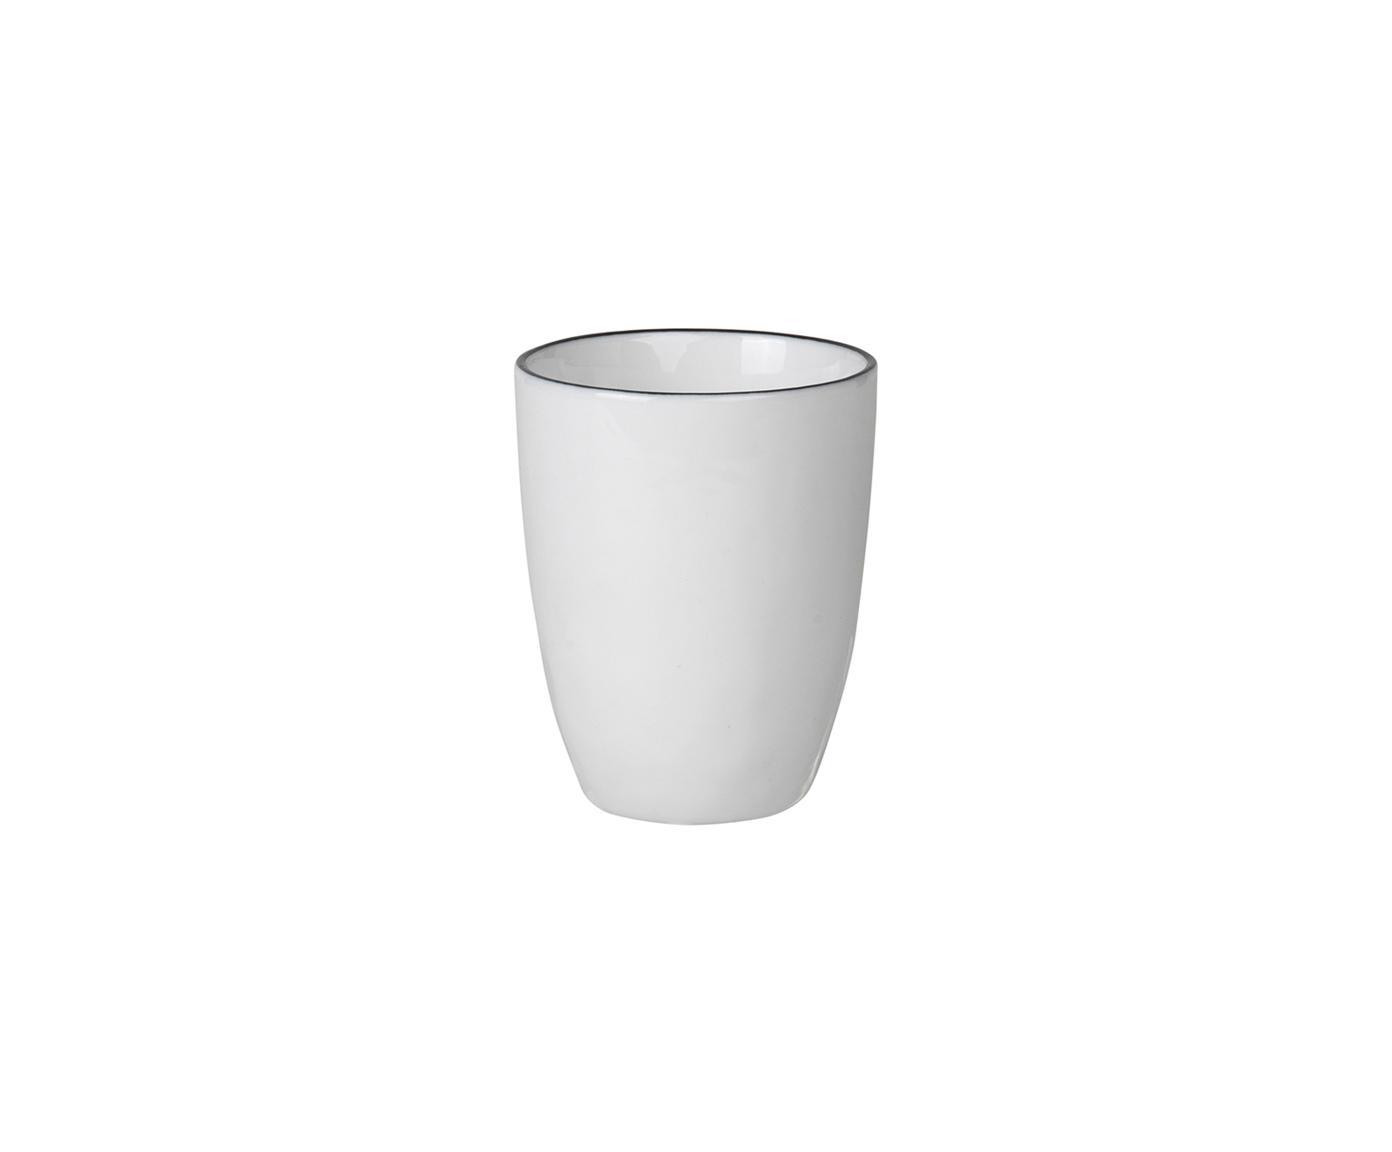 Tazas de café artesanales Salt, 4uds., Porcelana, Blanco crudo, negro, Ø 6 x Al 8 cm